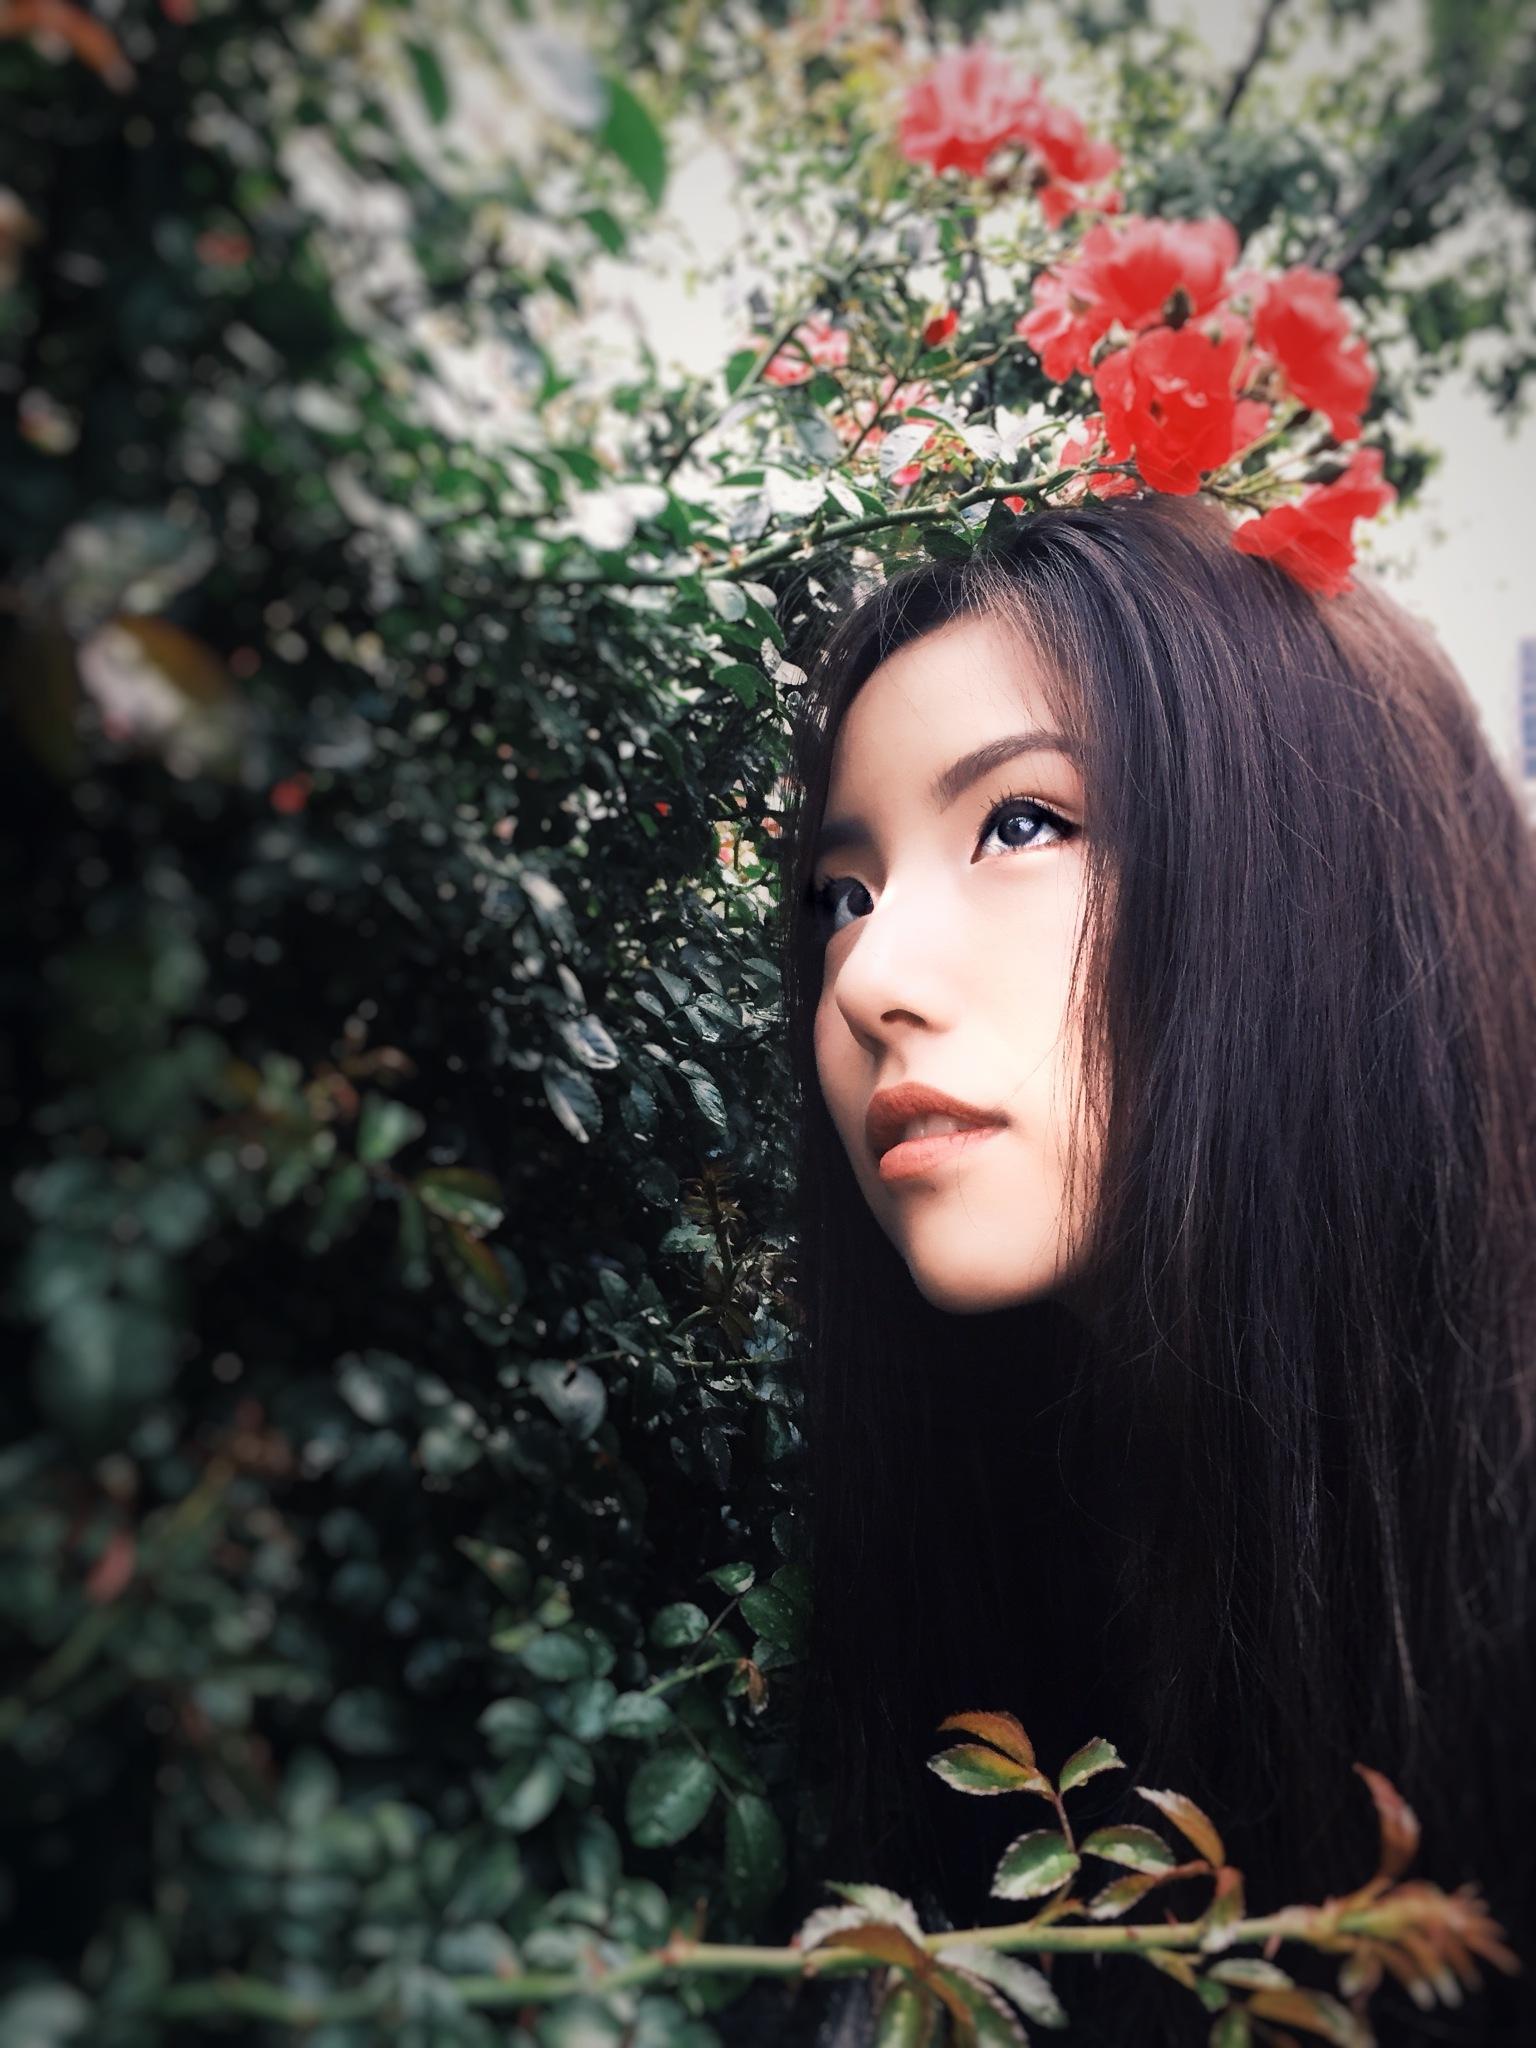 Ah..after the rain by Yoko D